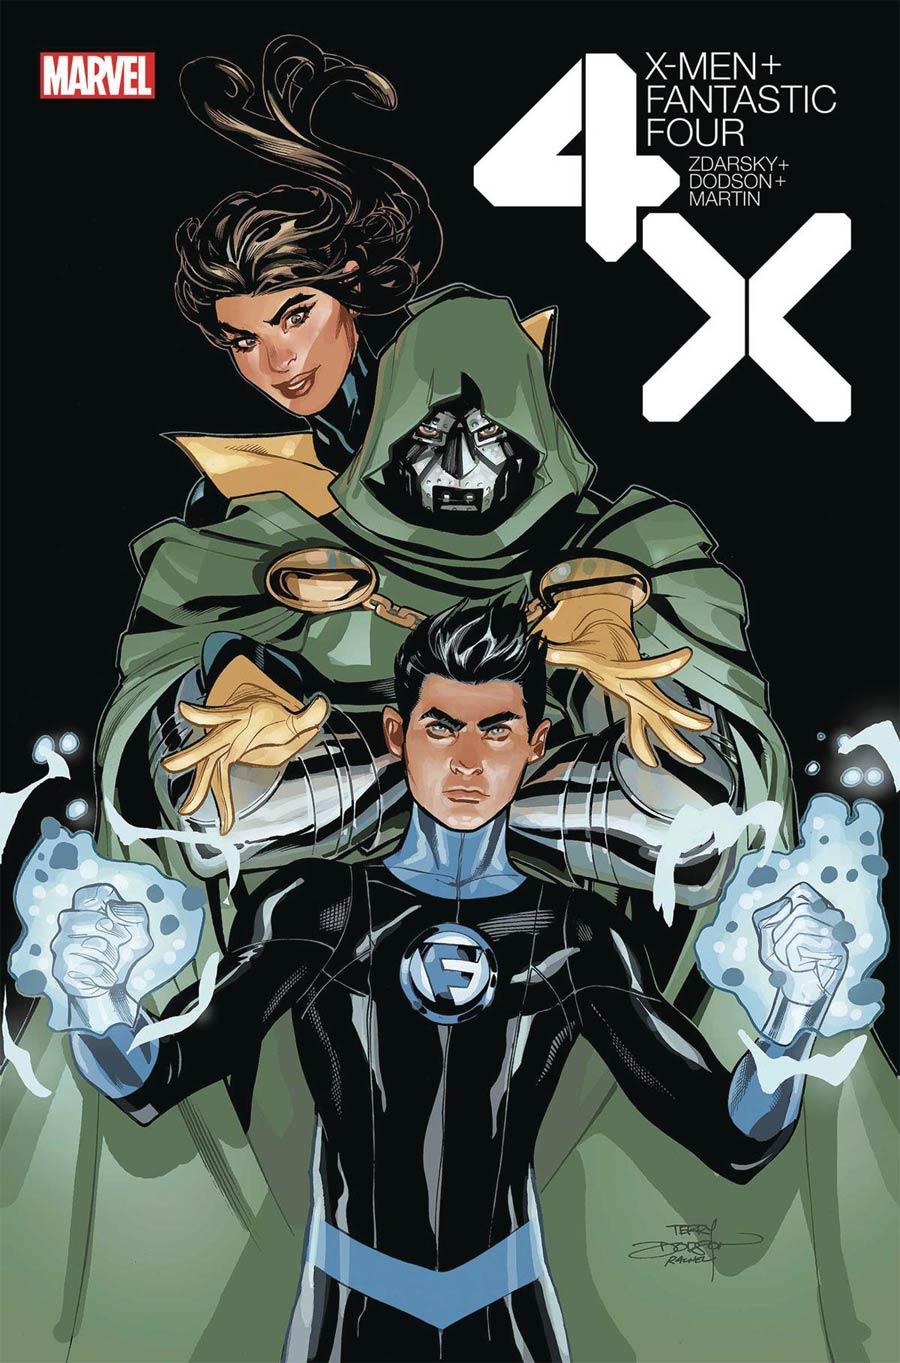 X-Men Fantastic Four Vol 2 #4 Cover A Regular Terry Dodson Cover